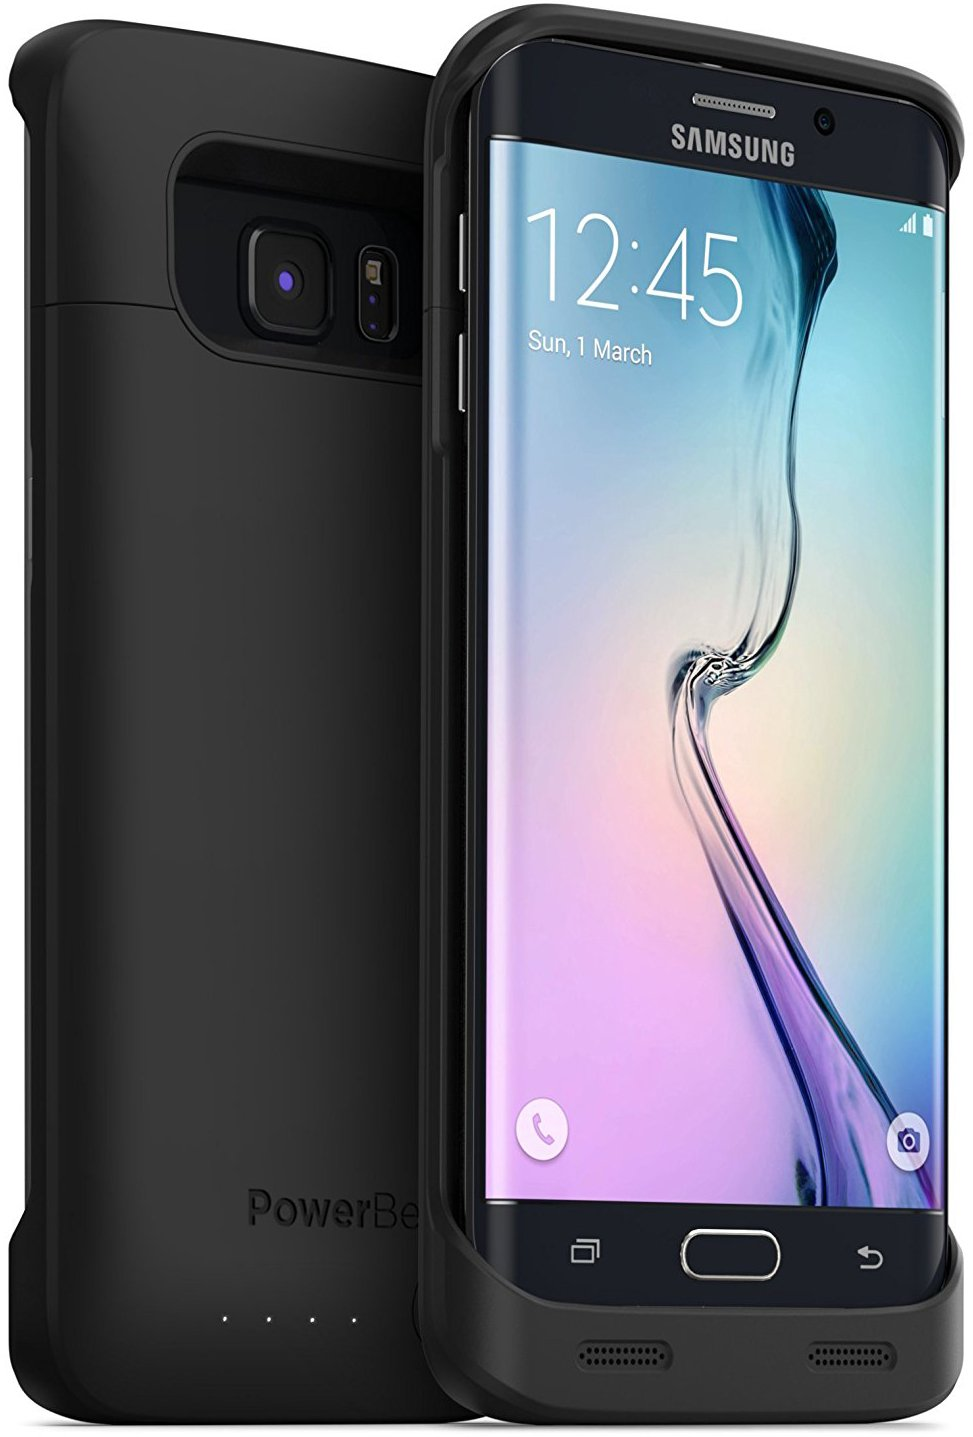 big sale e28cf 1a849 PowerBear Samsung Galaxy S6 Edge Battery Case [3500 mAh] External Battery  Charger for The Galaxy S6 Edge (Up to 1.35X Extra Battery) - Black [24  Month ...